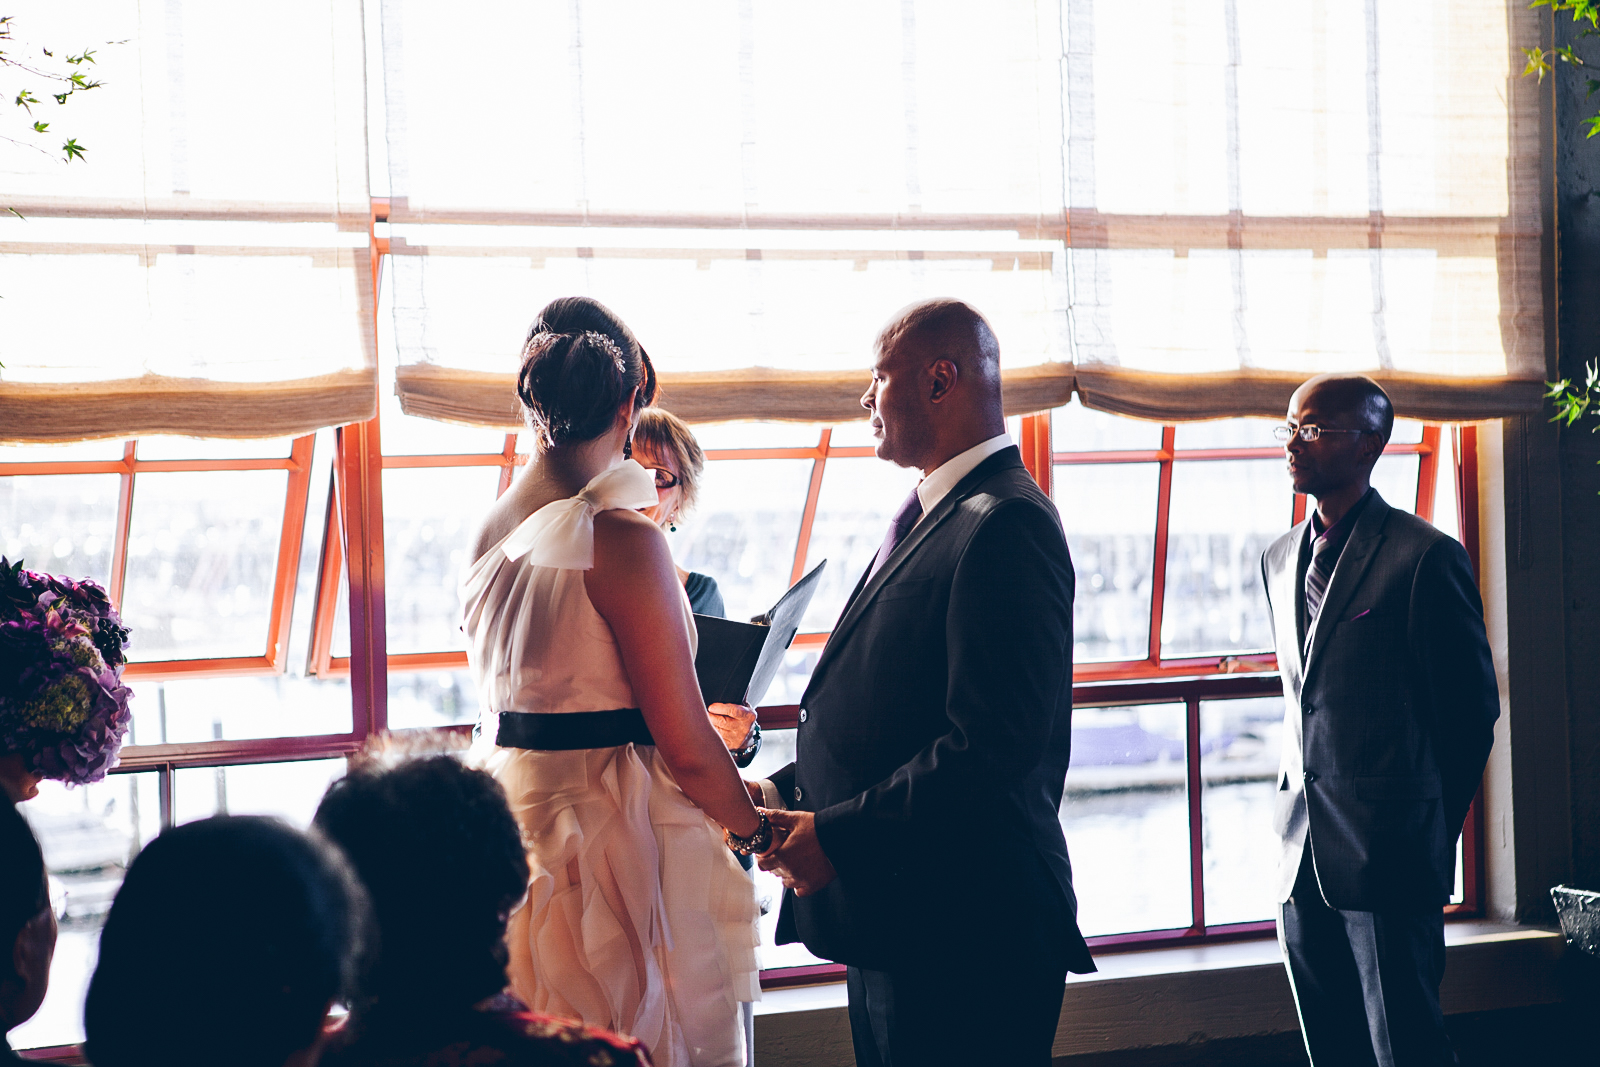 greens_restaurant_wedding_photography_san_franscisco_ebony_siovhan_bokeh_photography_49.jpg